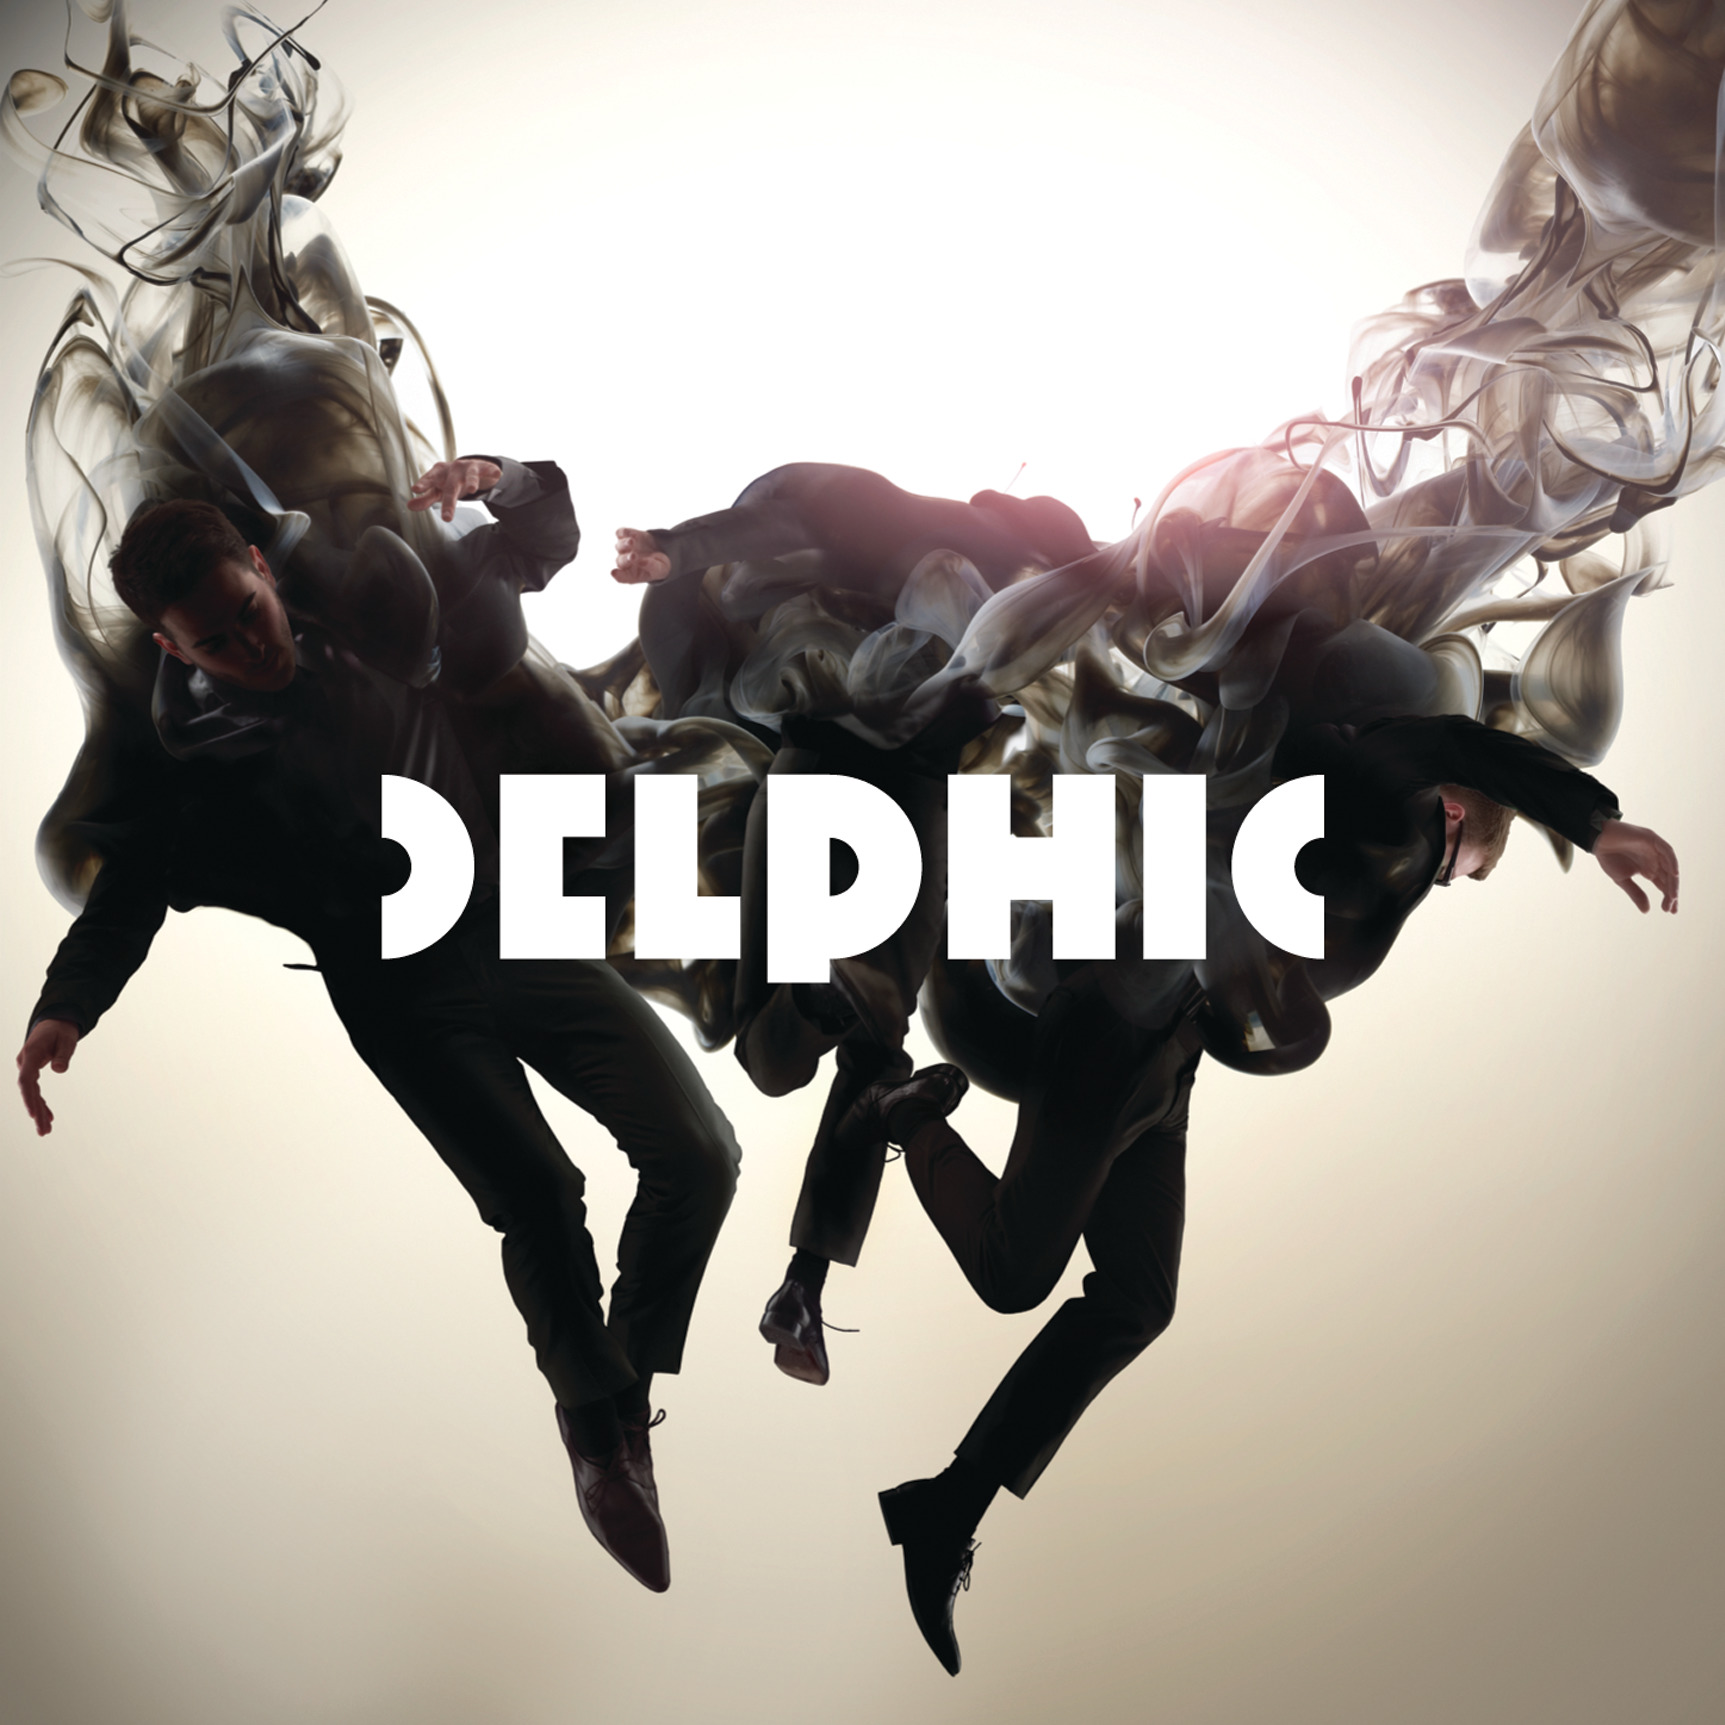 Delphic - Acolyte - Digital